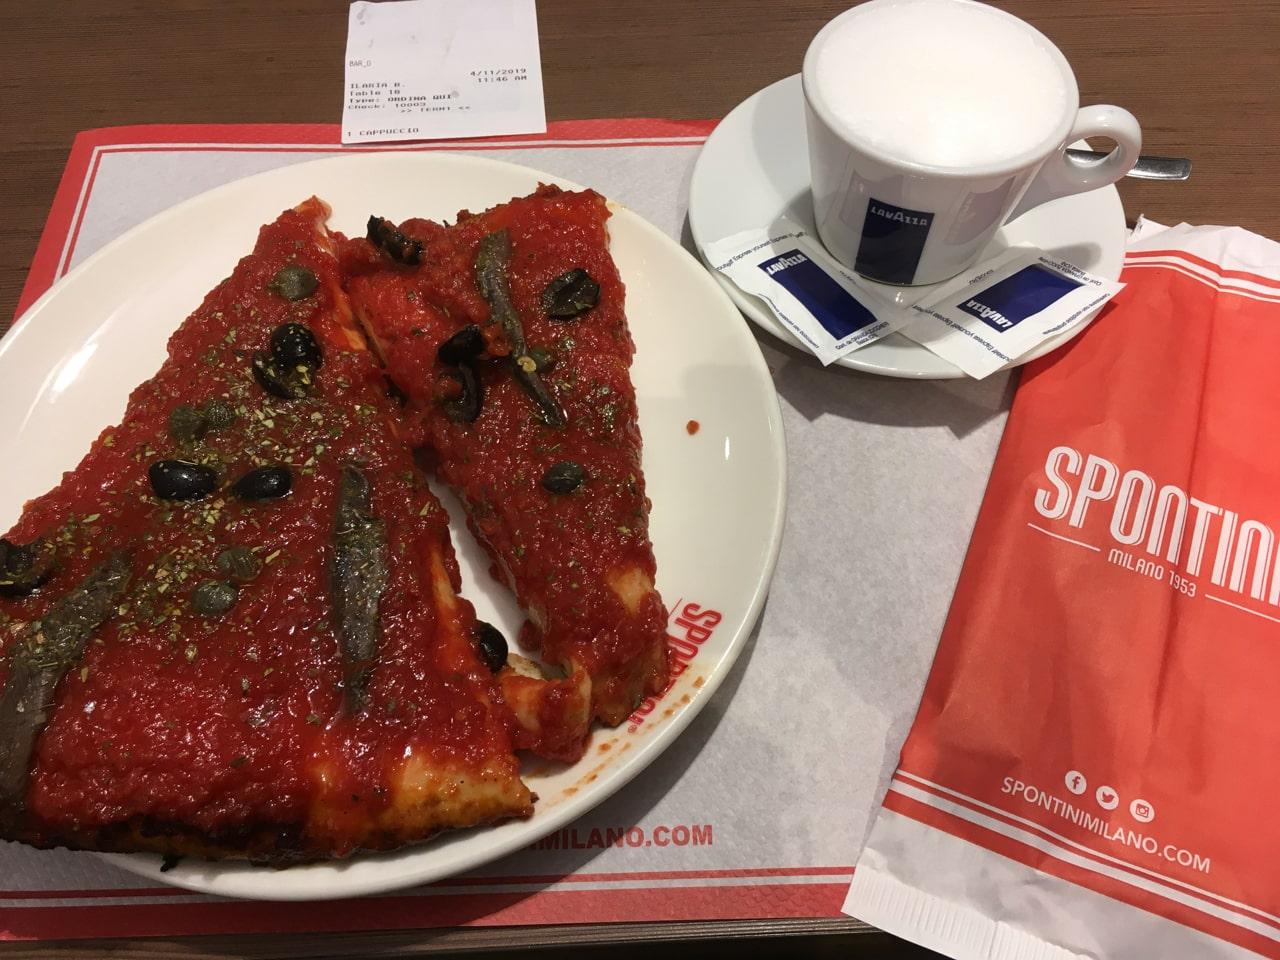 spontini的披萨号称是意大利最好吃的披萨。我成为离火车站比较近的这家spontini当天的第一个顾客,点了份地中海(mediterranea)风味的披萨,结果,太难吃了吧,又酸又苦,可能是我点的口味不对,我记得攻略上说这家披萨店只有一种口味的啊,看来还得再试一次